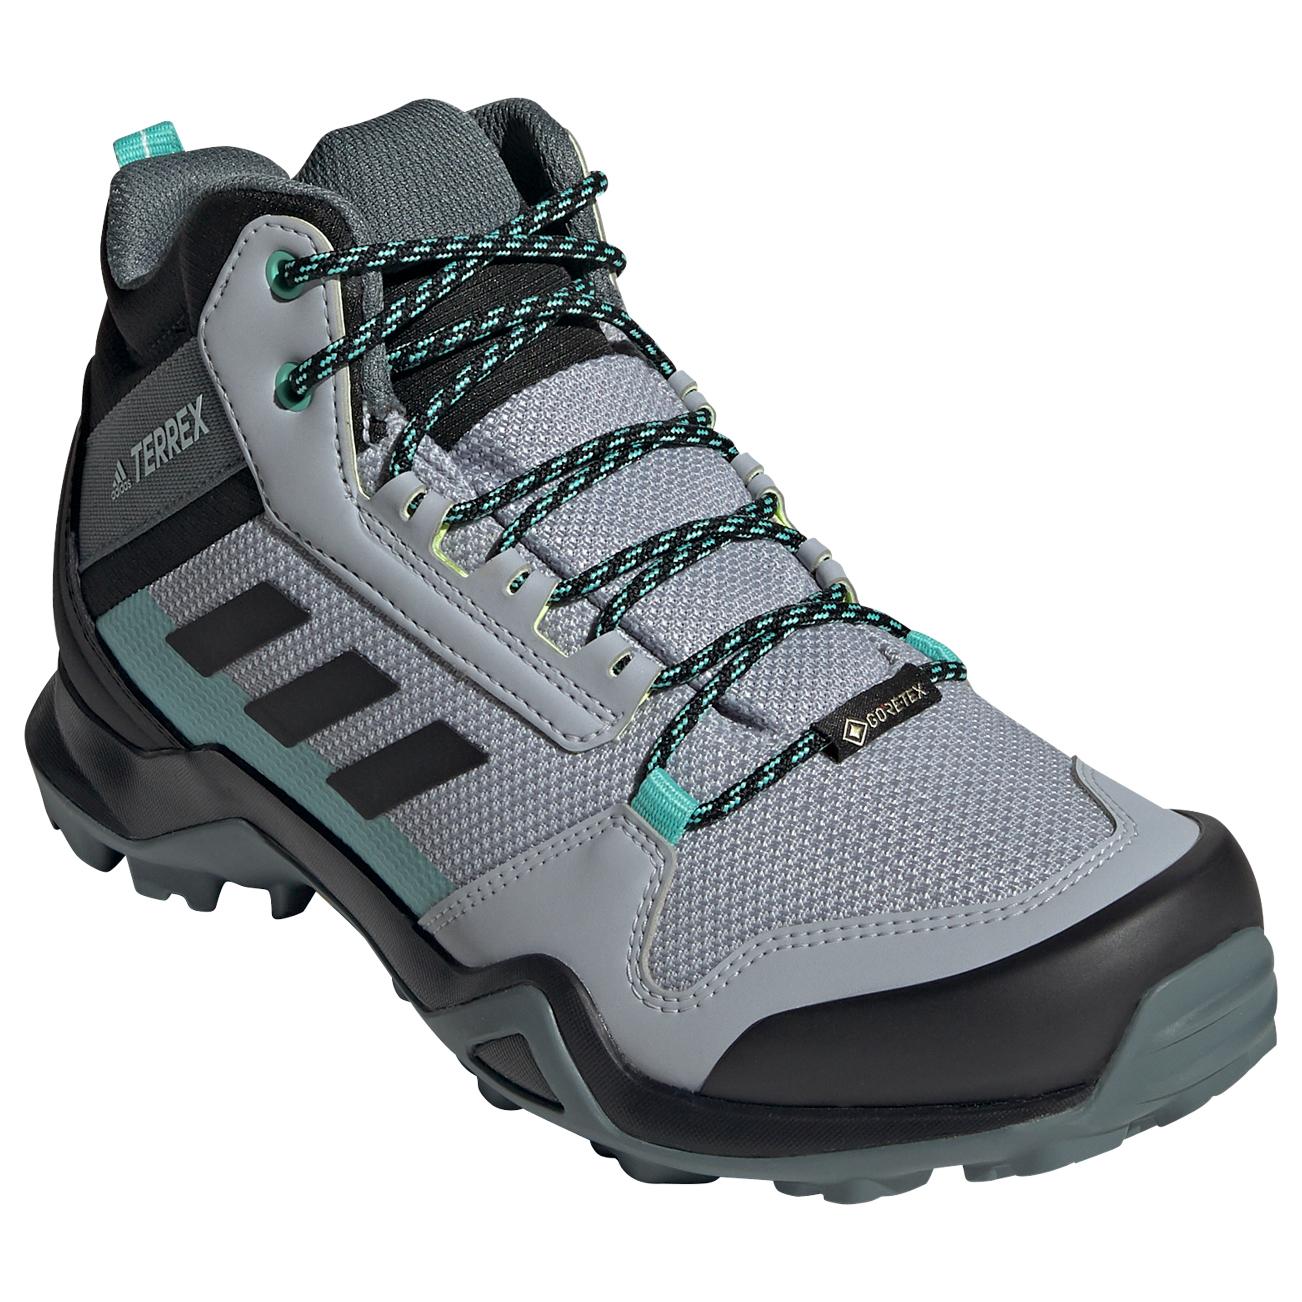 adidas - Women's Terrex AX3 Mid GTX - Walking boots - Core Black / Dgh Solid Grey / Purple Tint | 4 (UK)